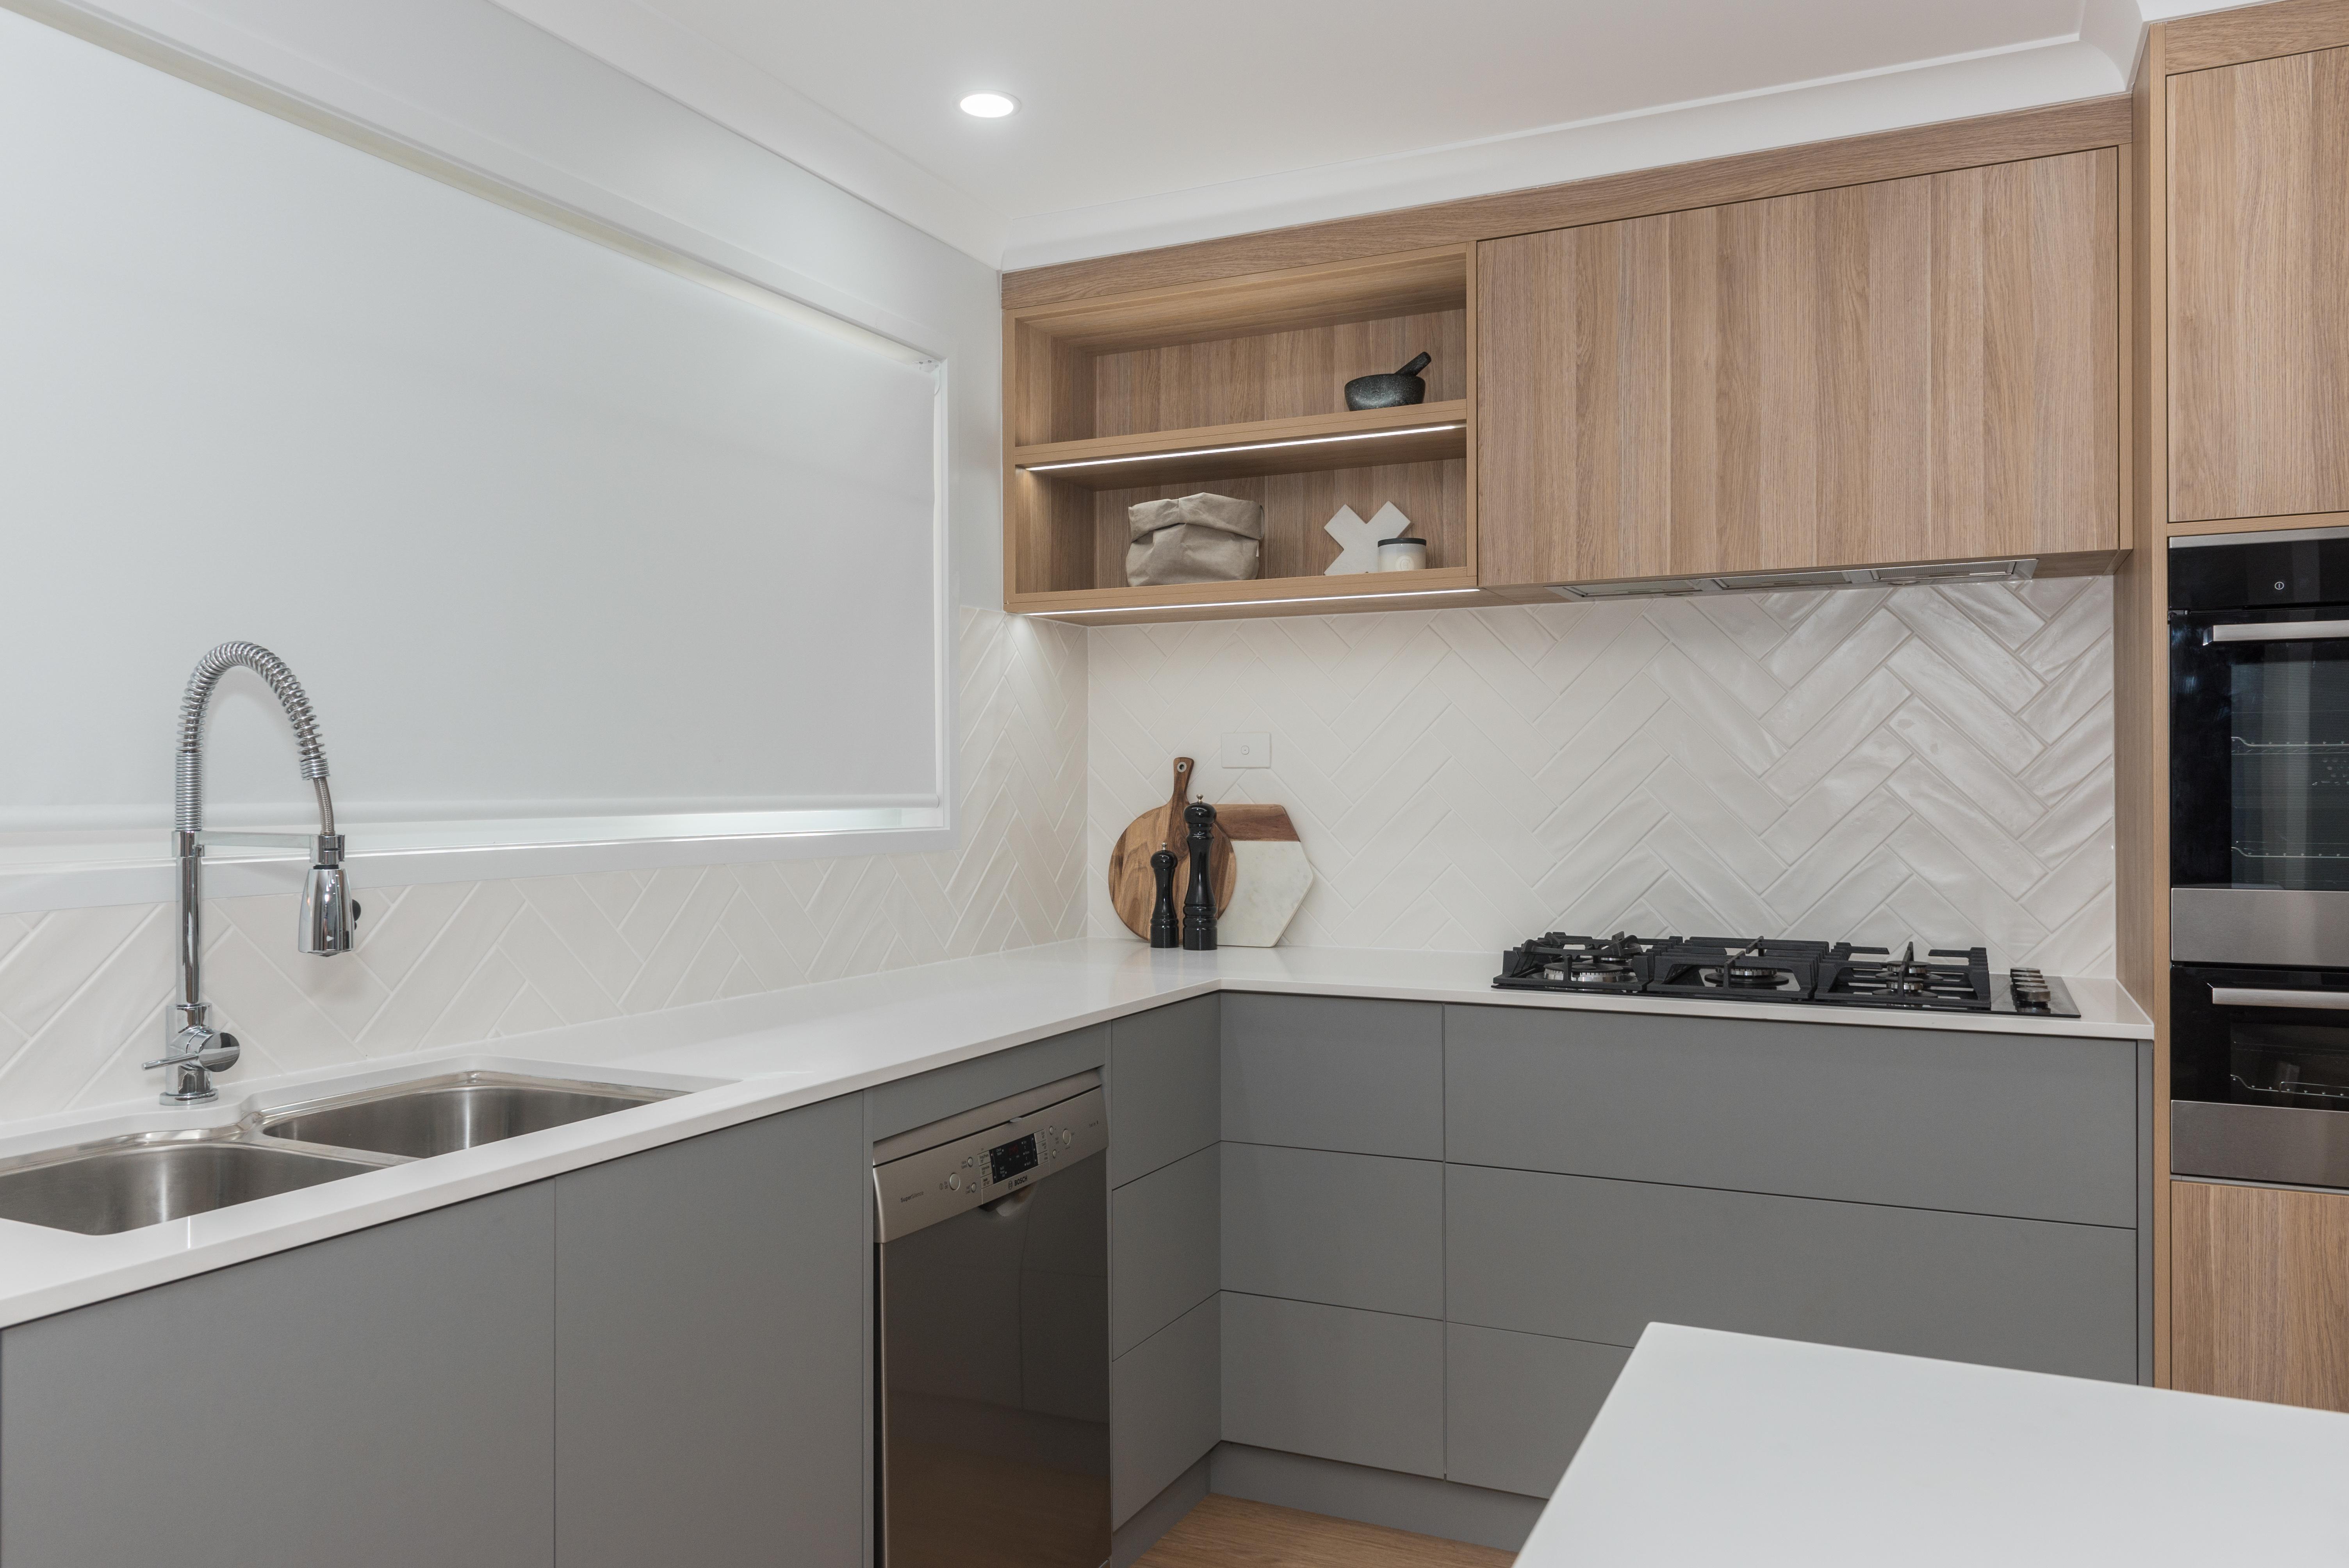 Ashton Home. Ashton Home   giw designs interior decor interior design gladstone